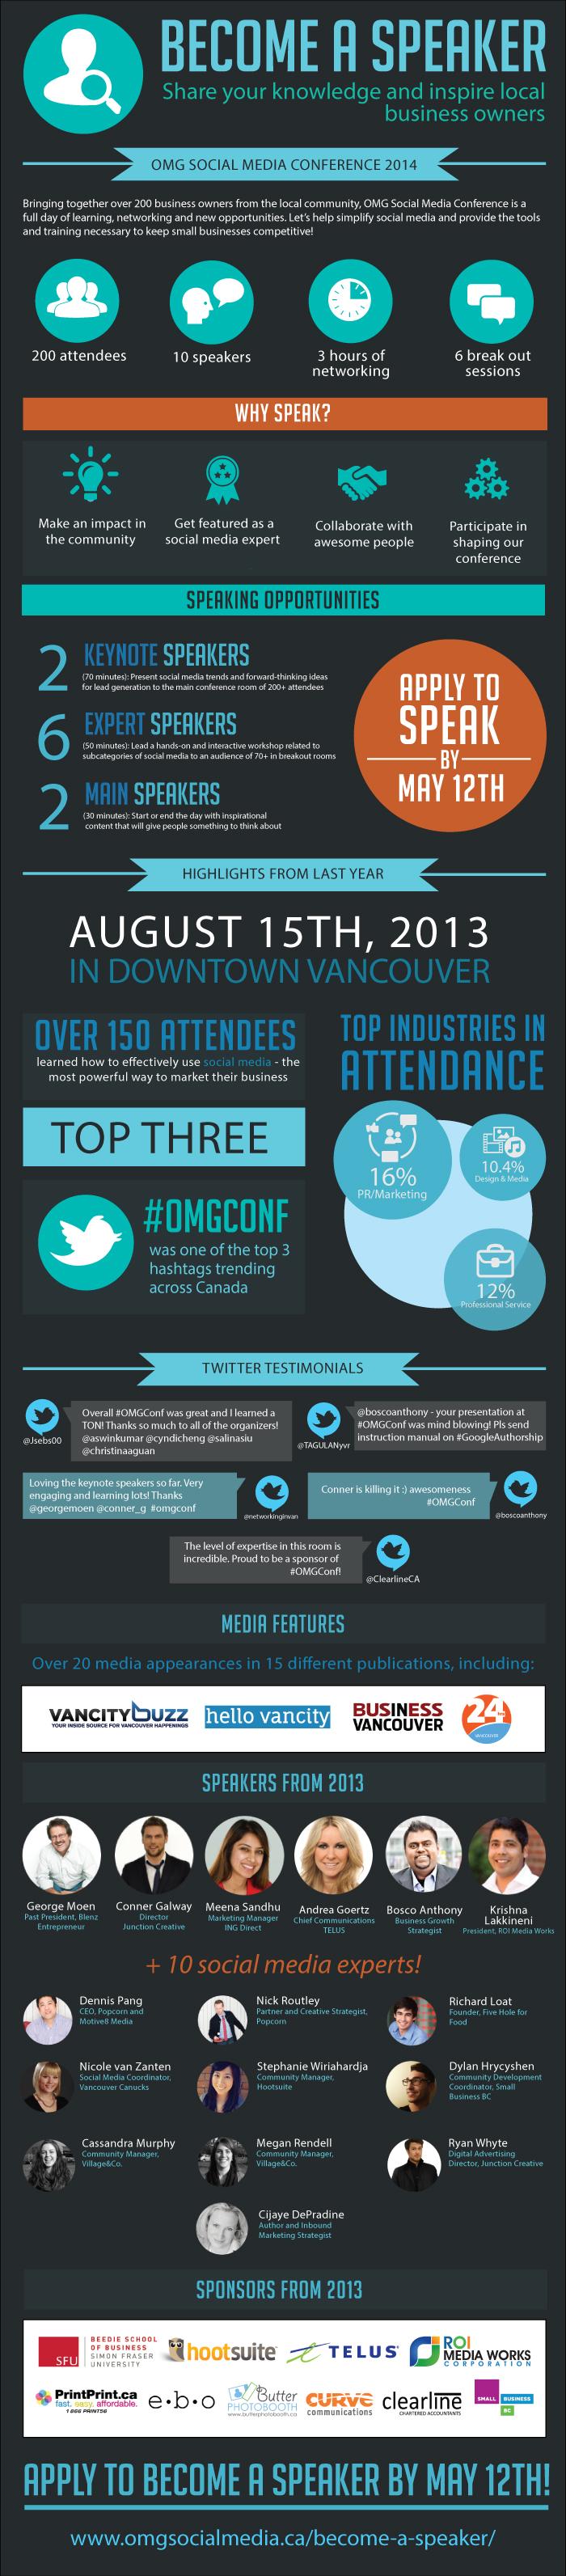 OMG Social Media Infographic